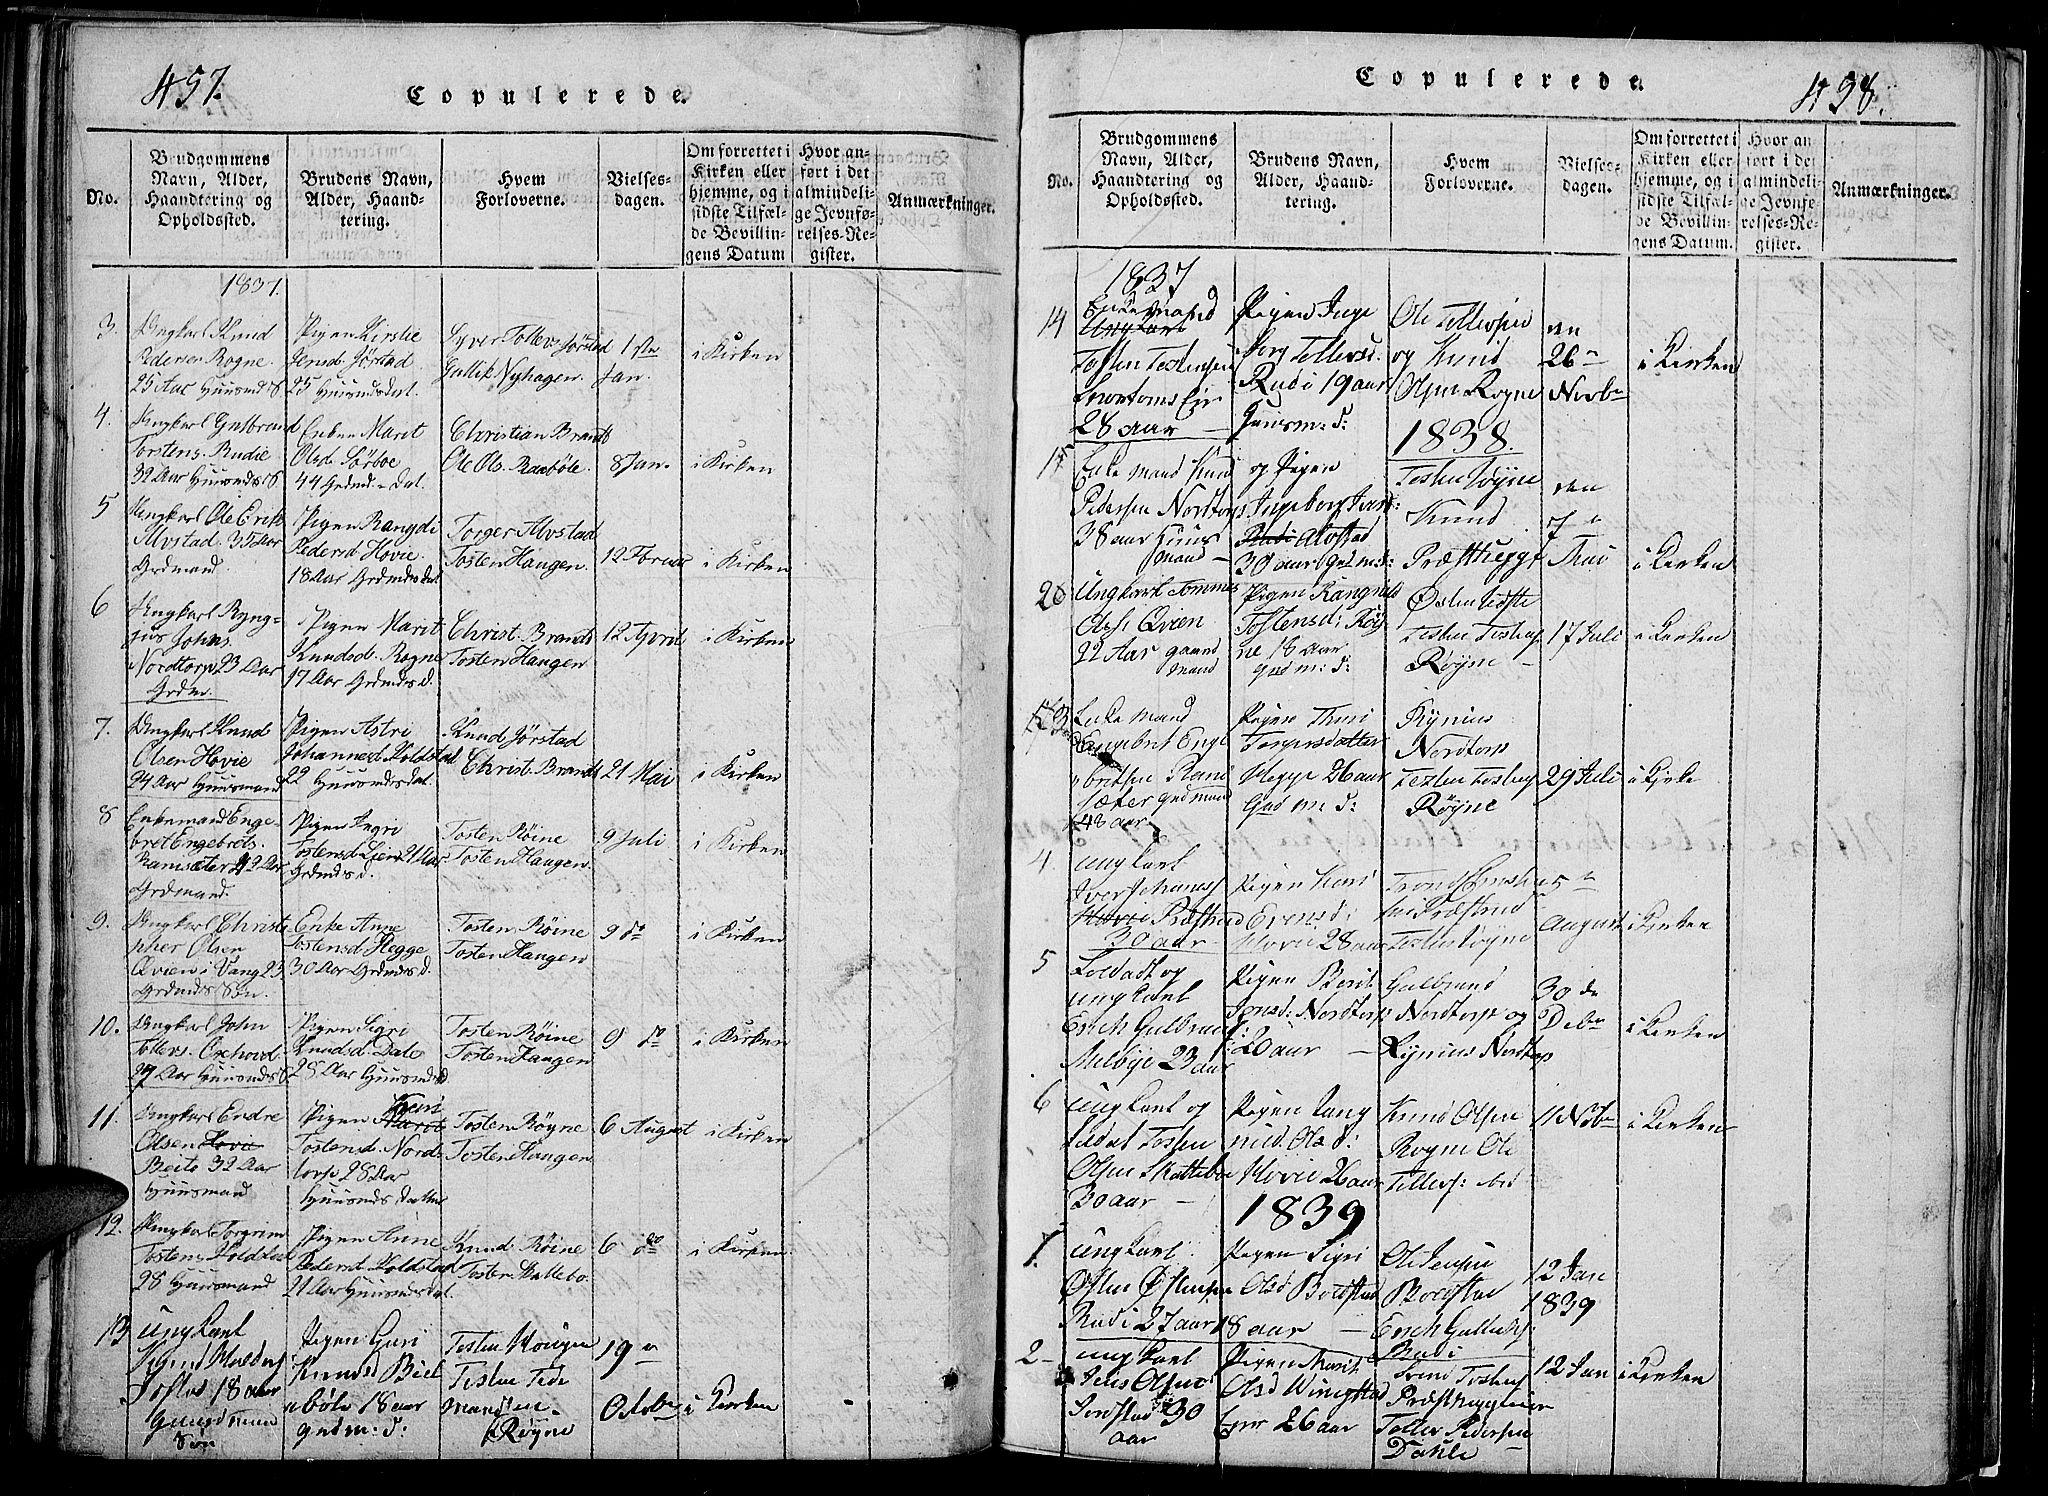 SAH, Slidre prestekontor, Klokkerbok nr. 2, 1814-1839, s. 457-458